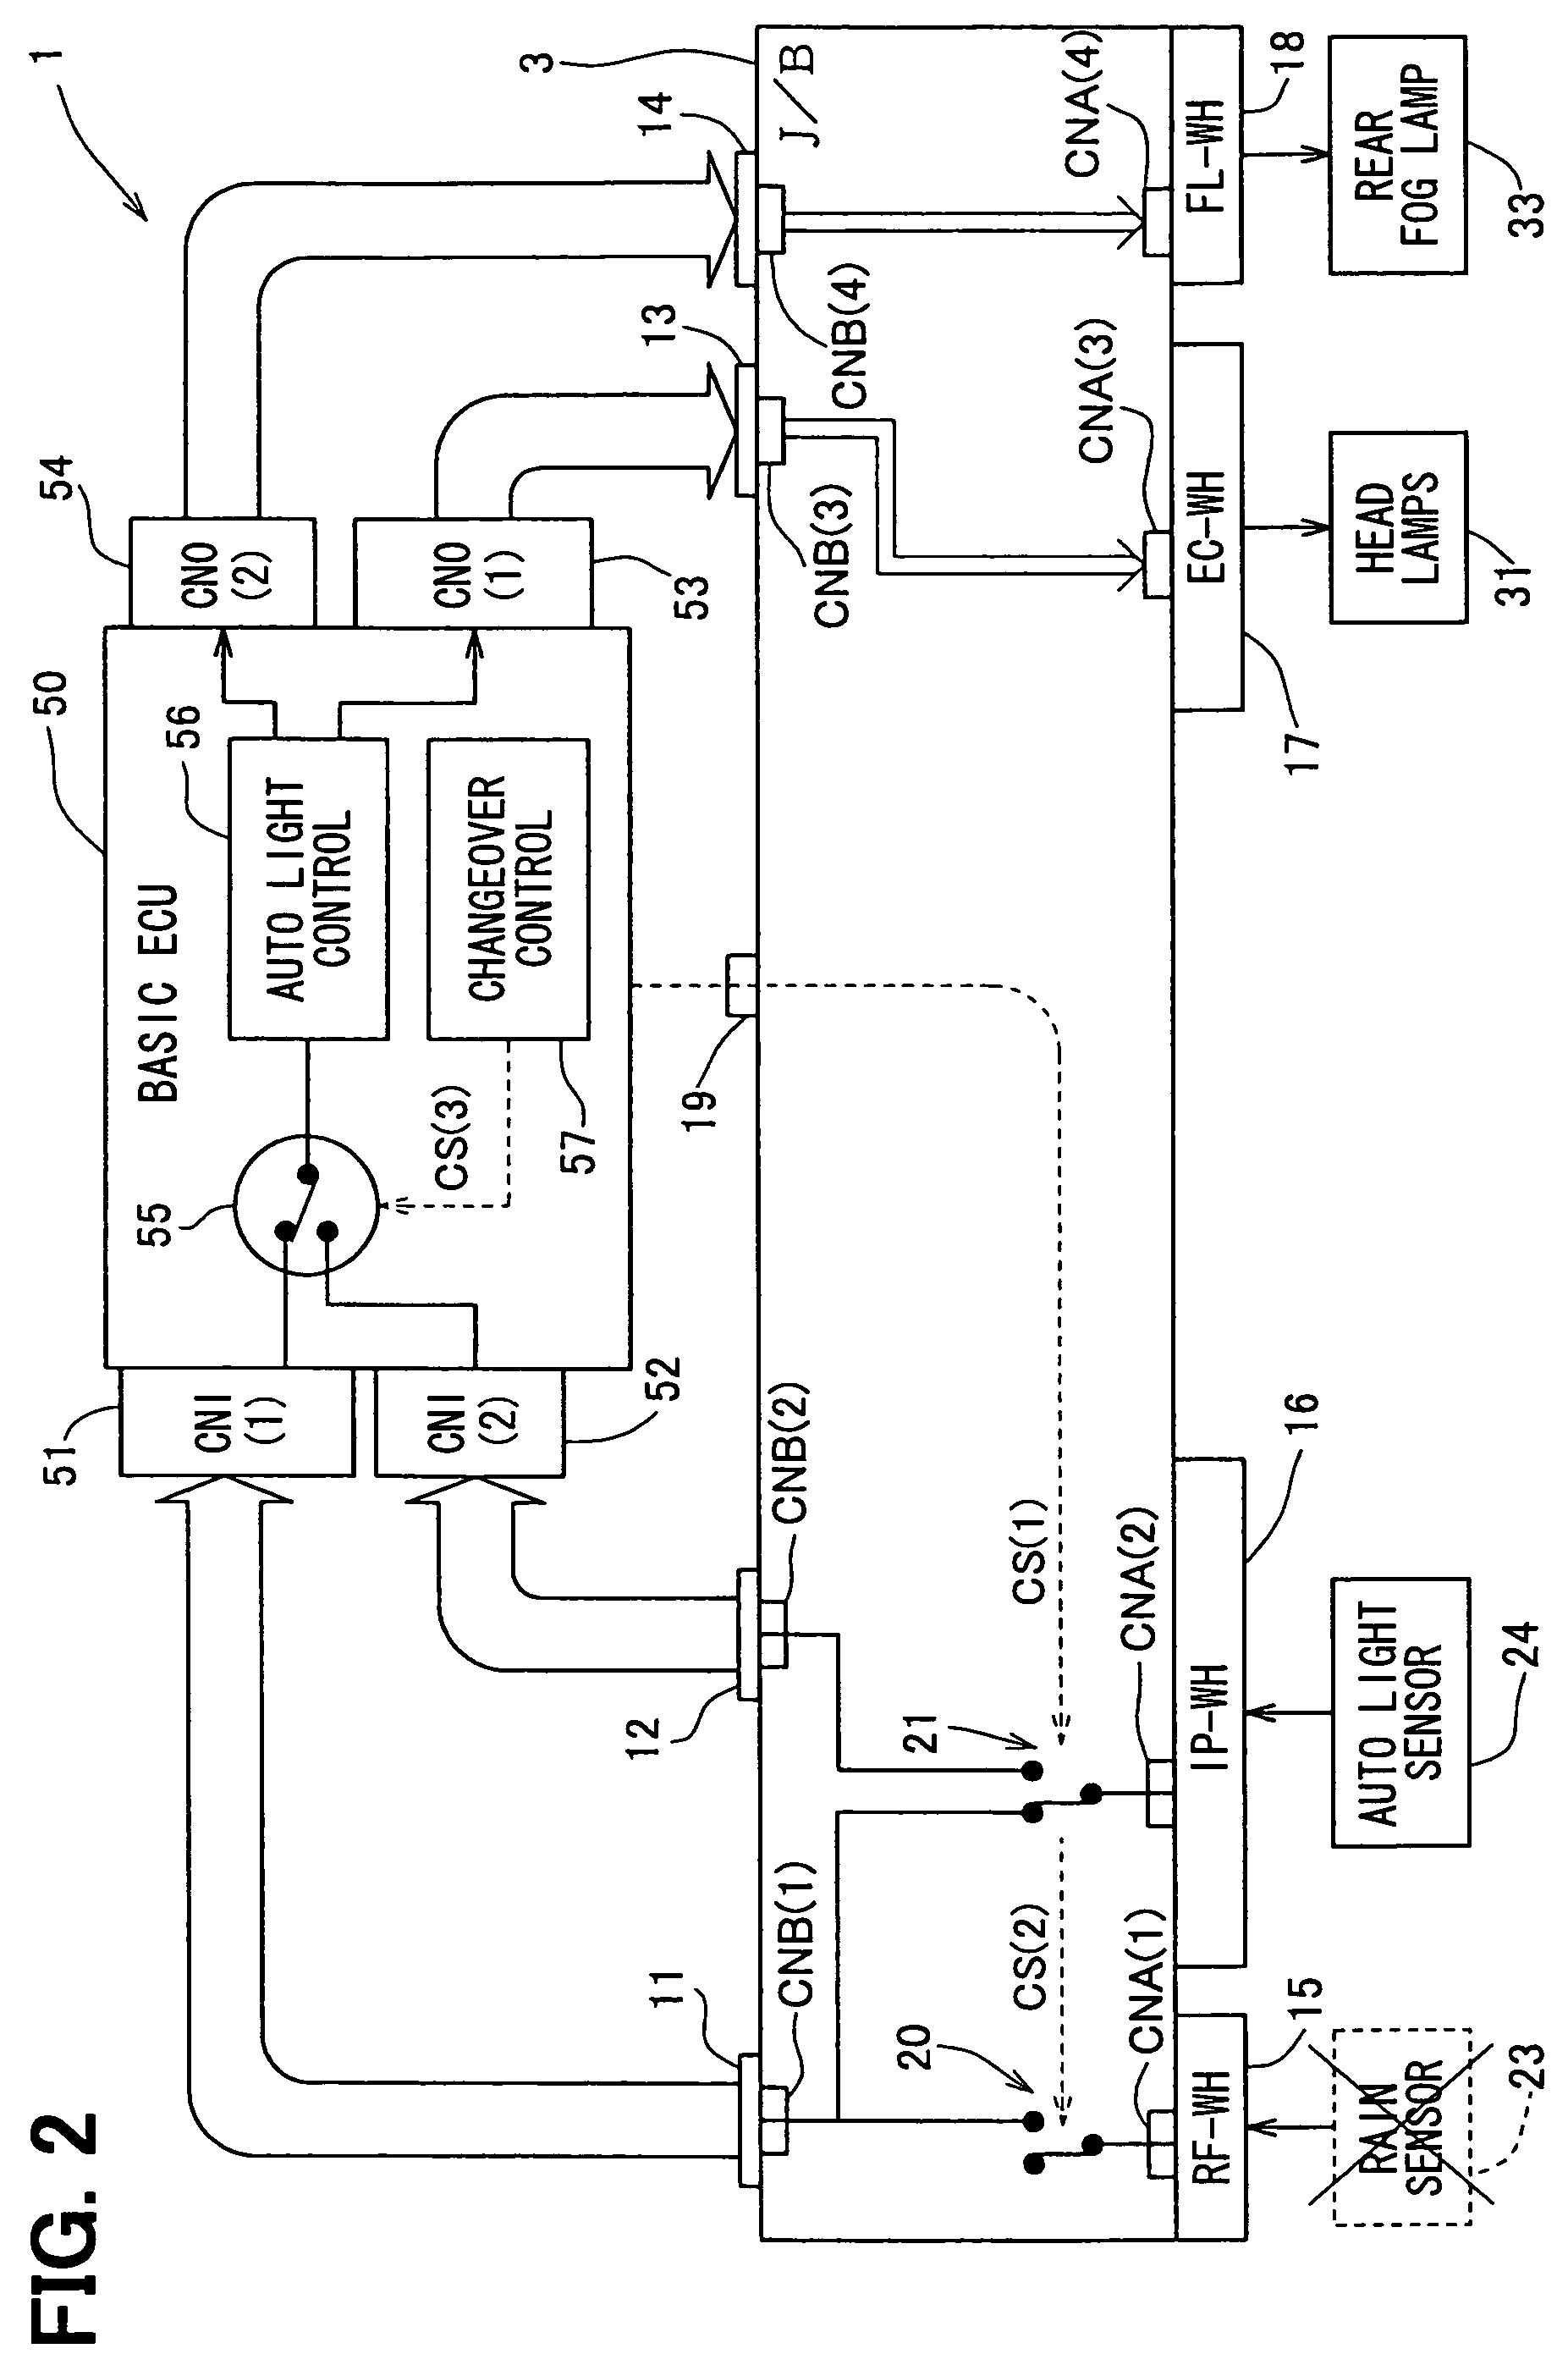 Ballast Wiring Diagram Also 277 Volt Lighting Reading A